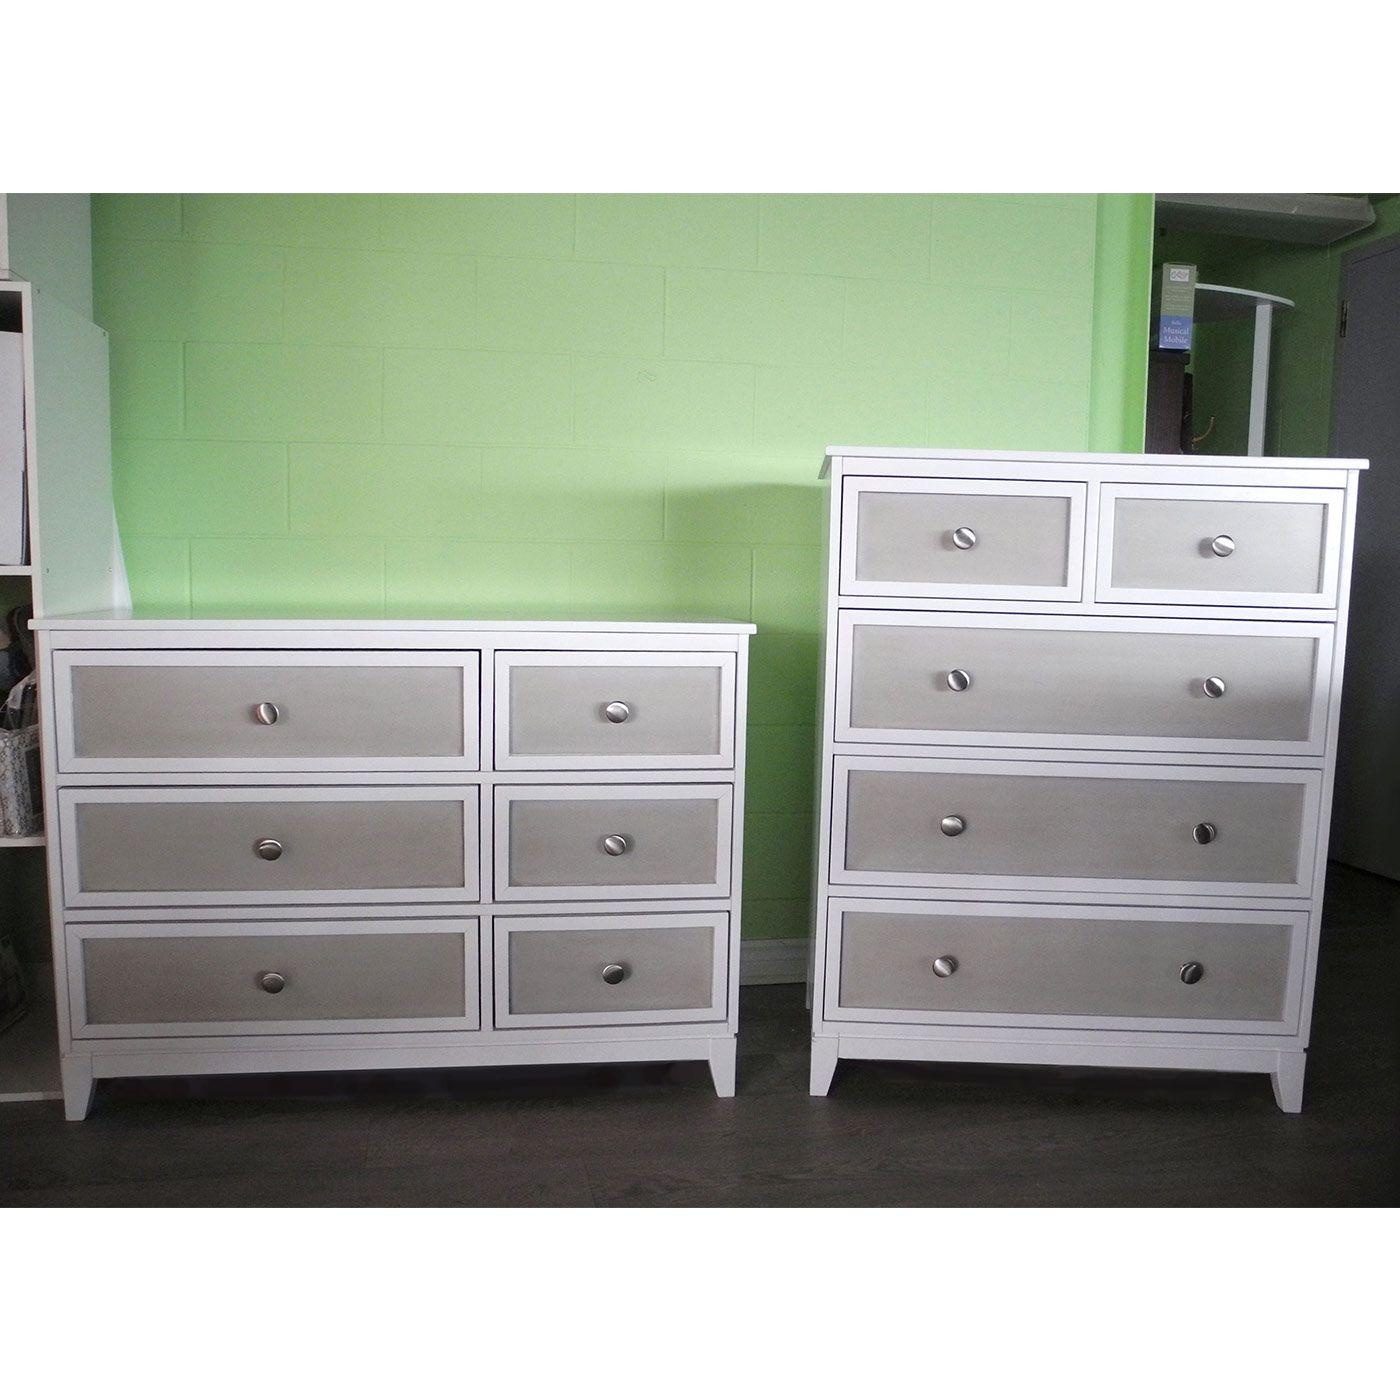 walmart children finish dresser com ip table changing drawer grey choose your delta